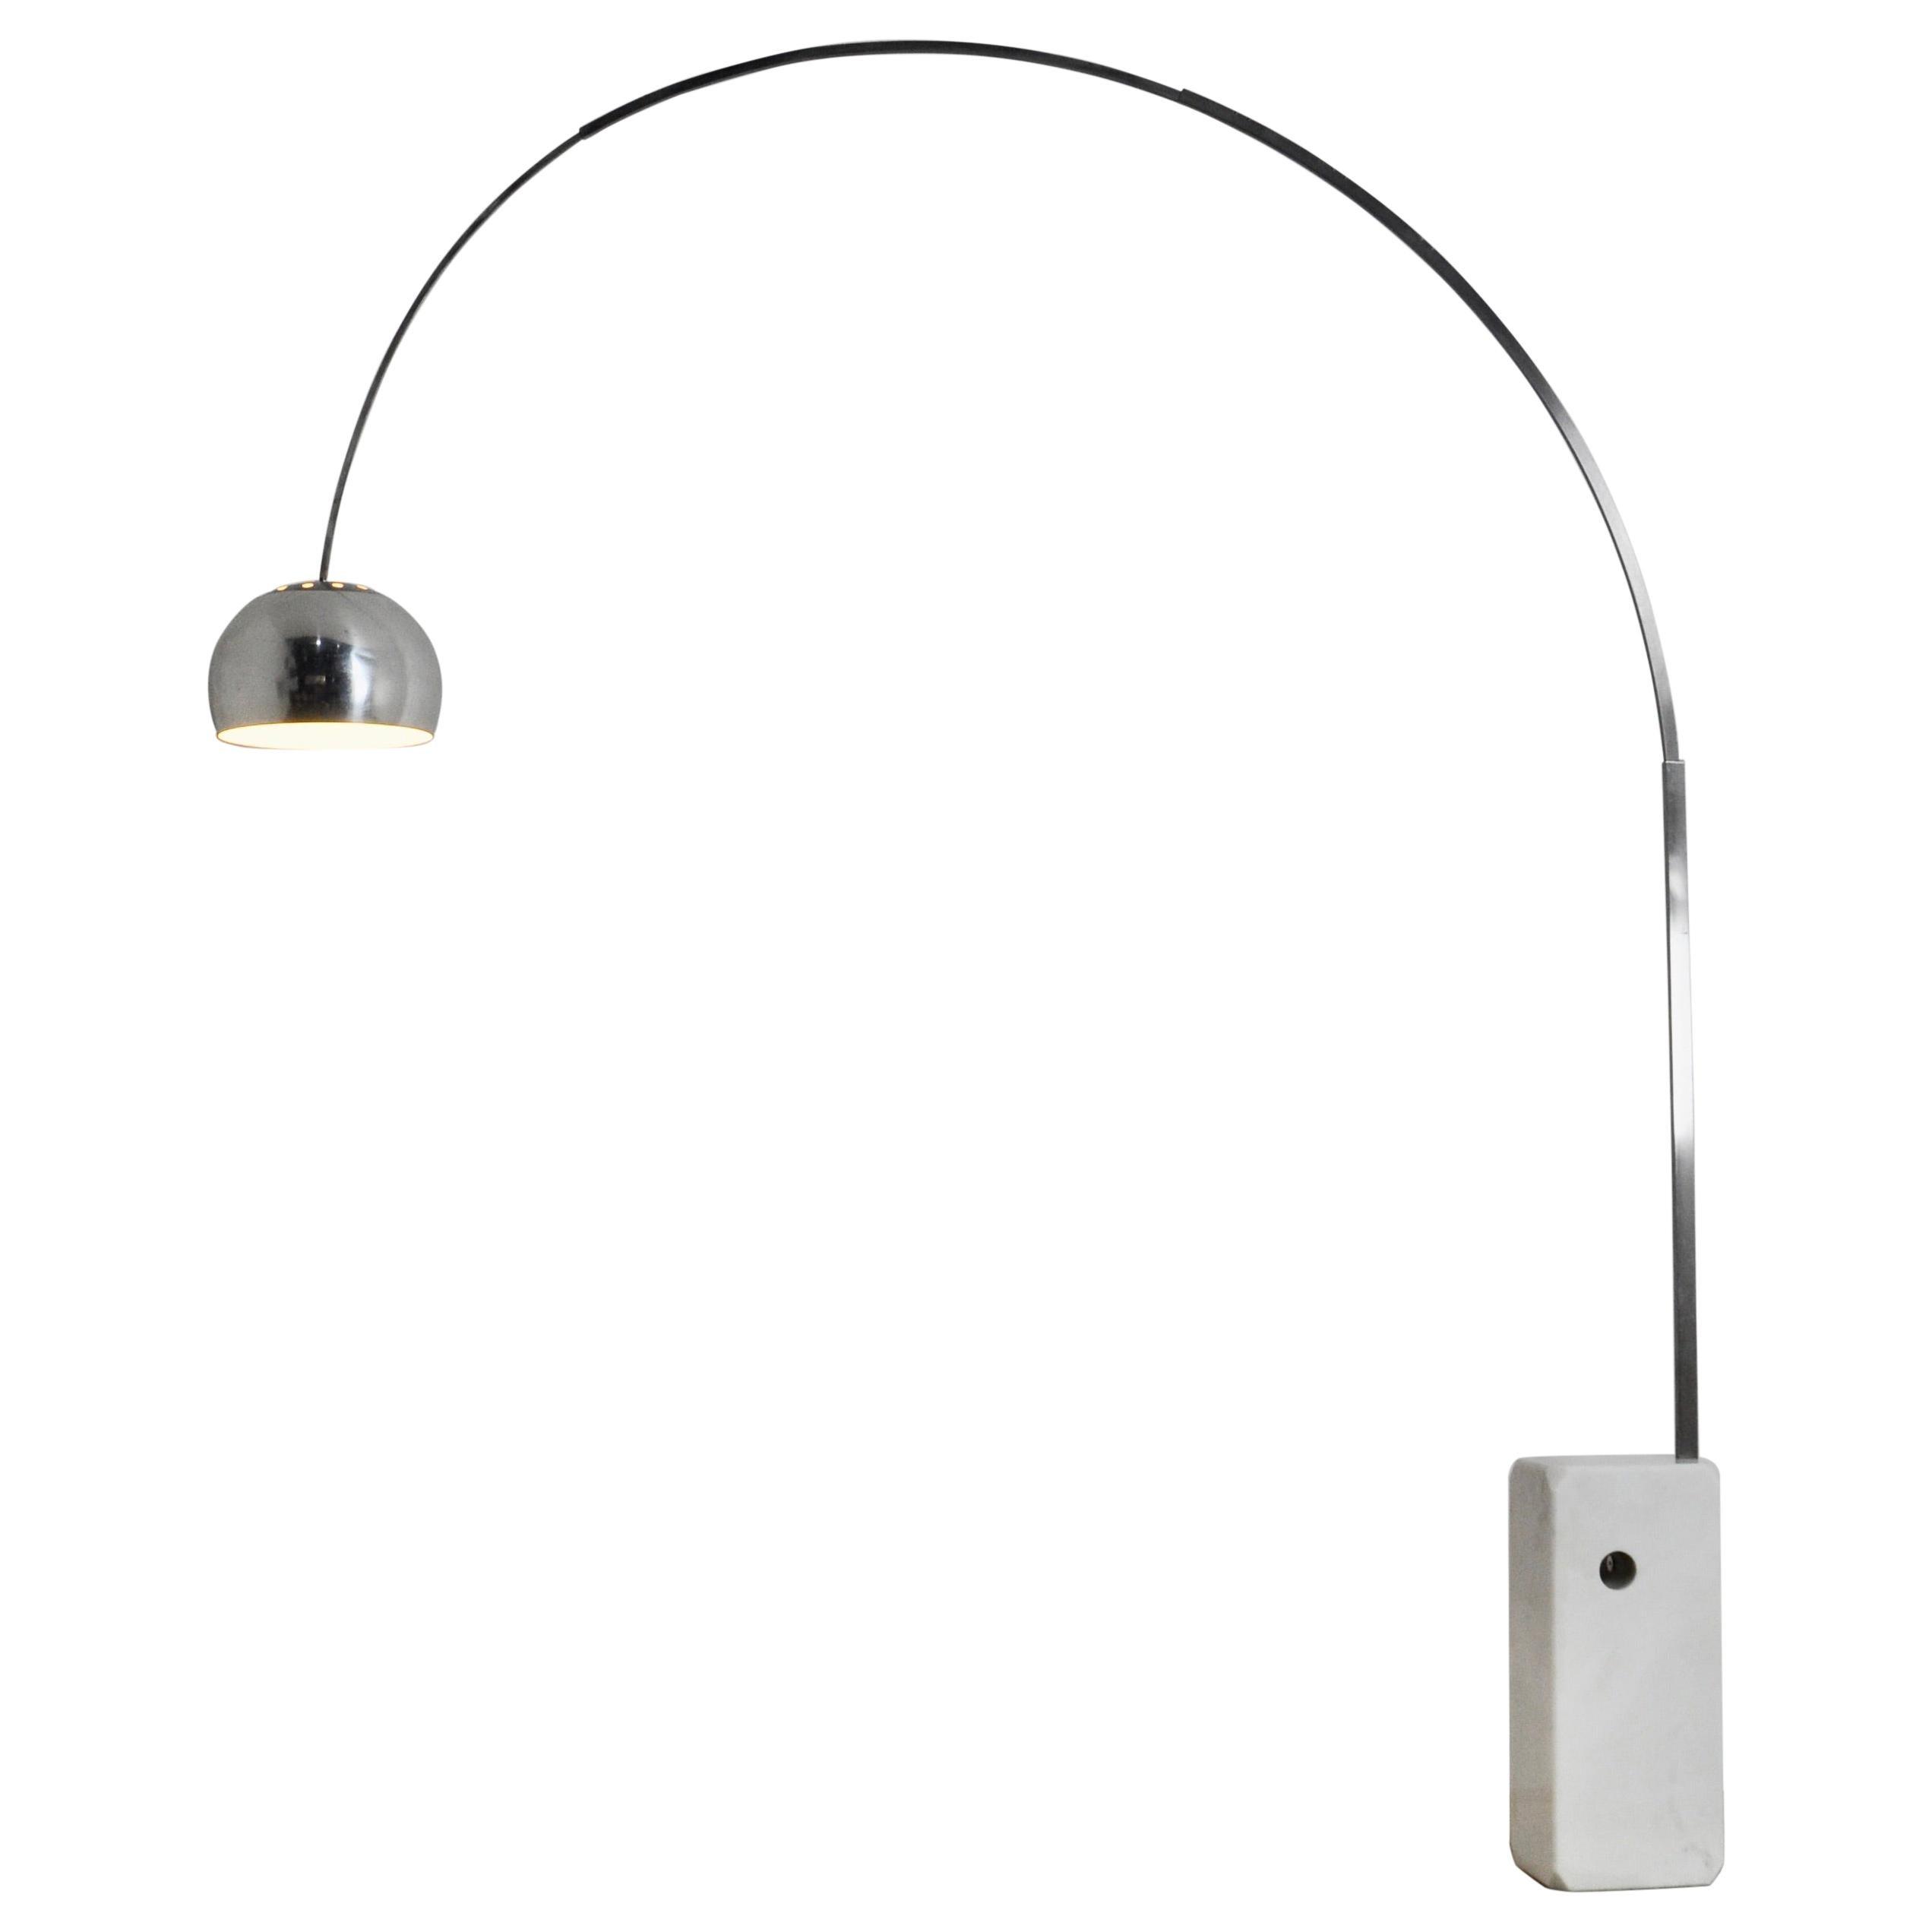 Italian Arco Floor Lamp by Achille Castiglioni & Pier Giacomo for Flos, 1960s